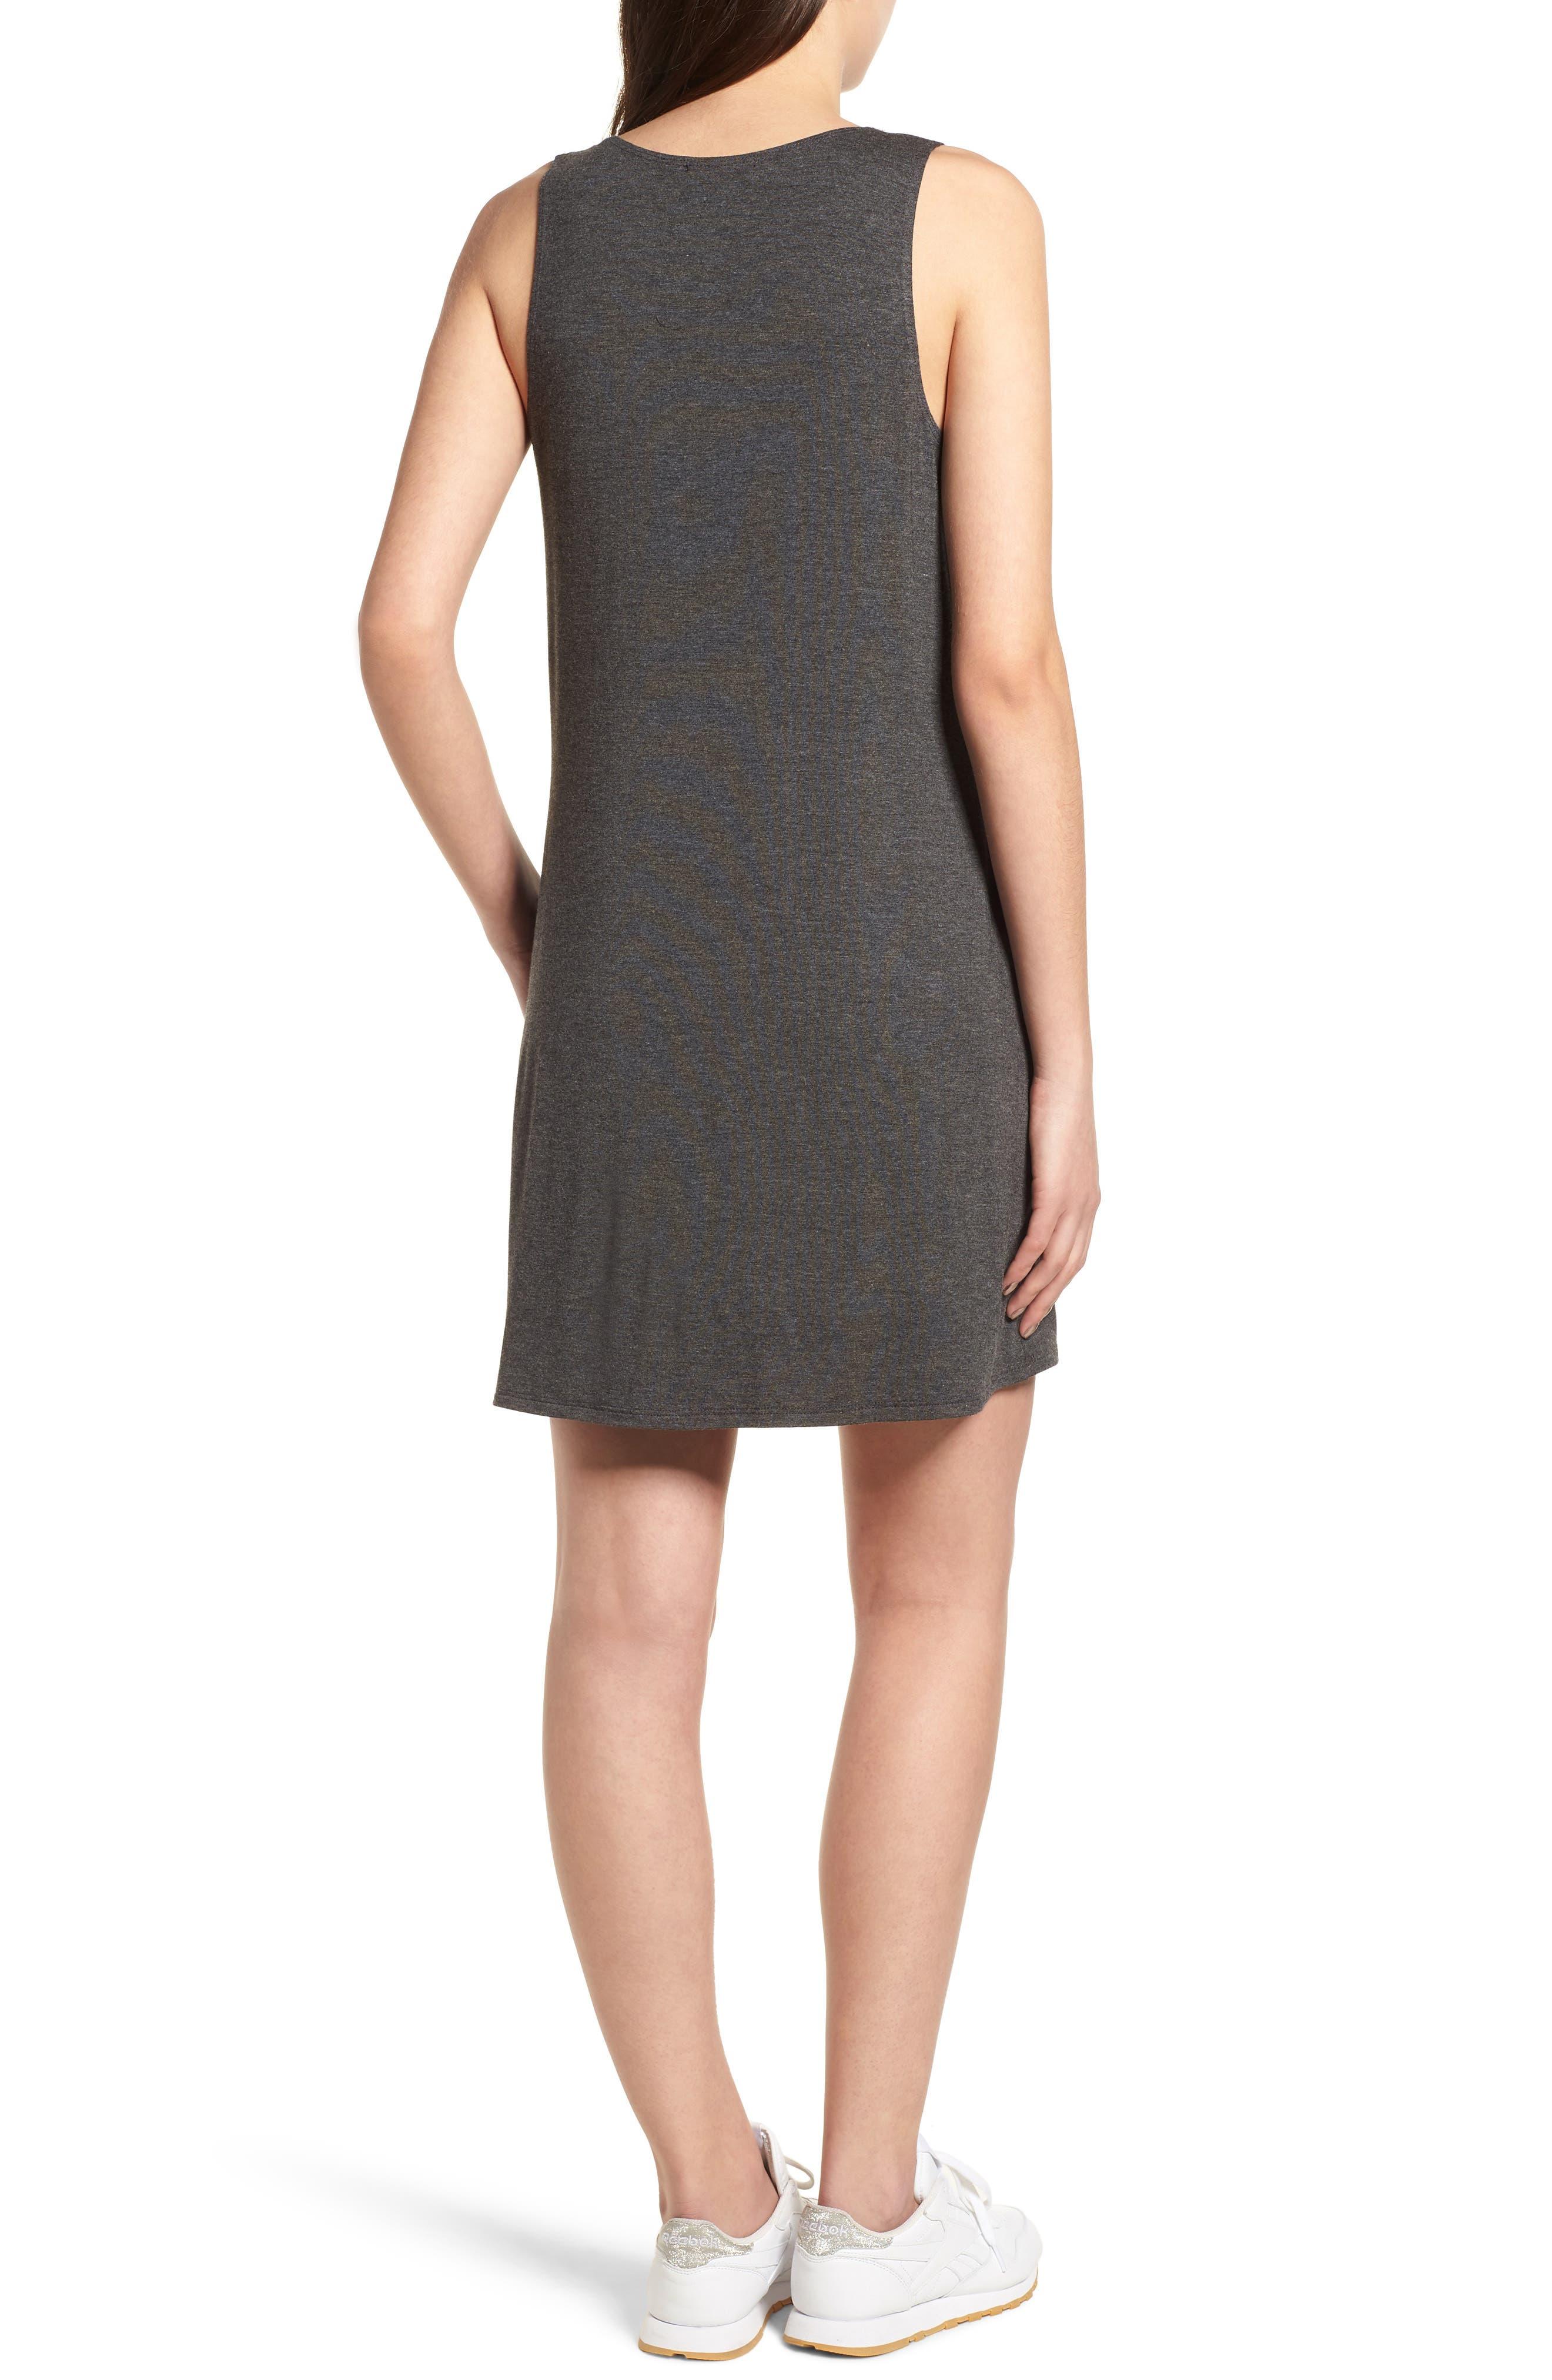 Pocket Tank Dress,                             Alternate thumbnail 2, color,                             Dark Charcoal